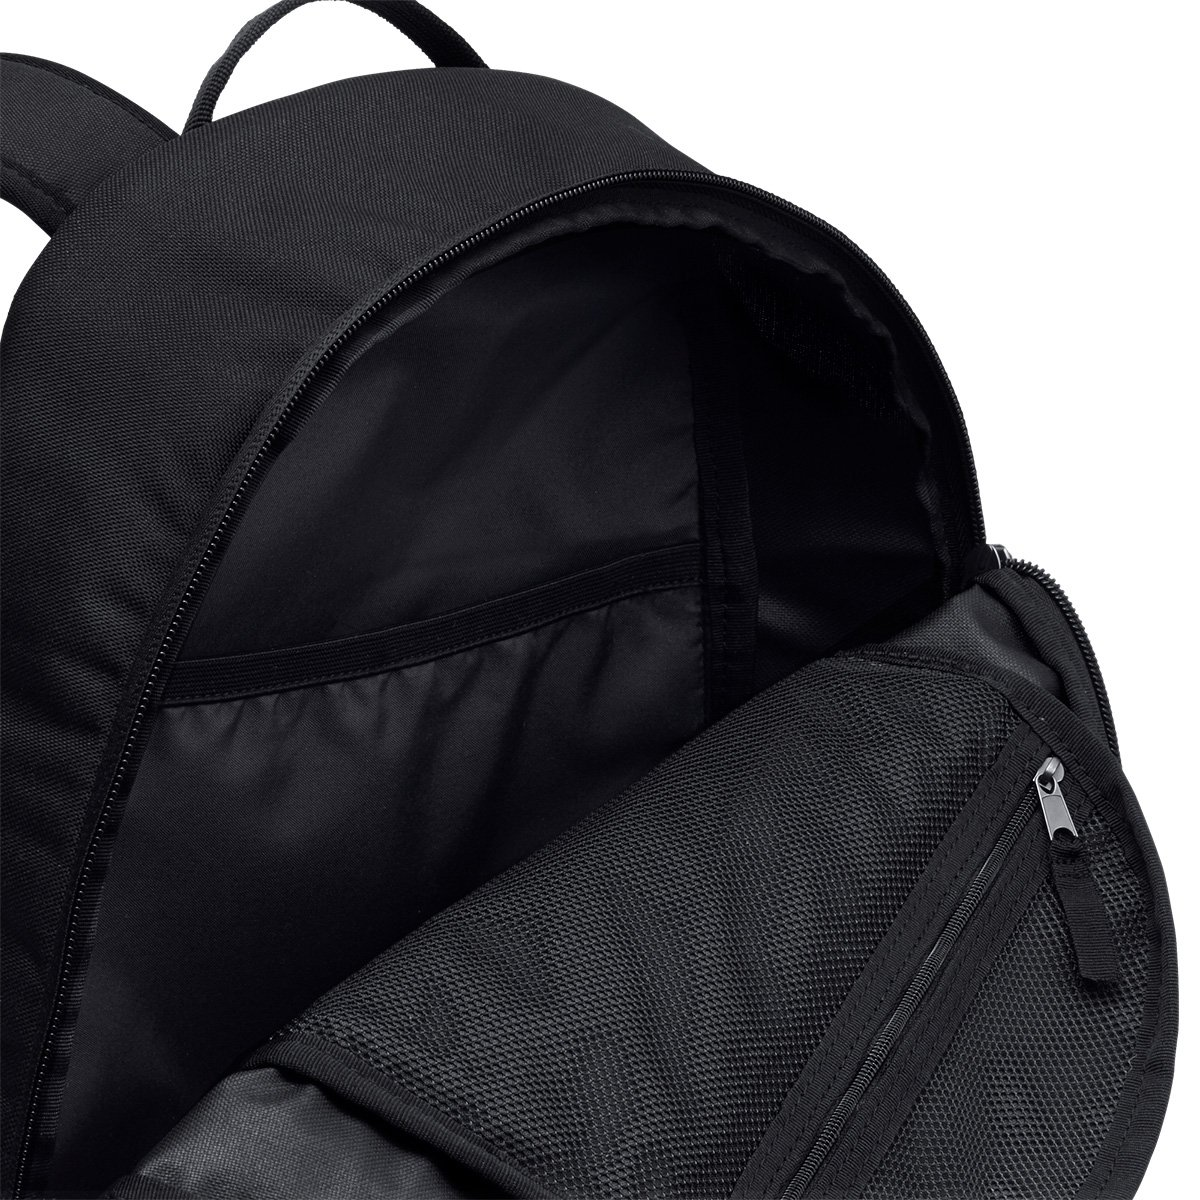 Mochila Nike SB Courthouse Masculina - Preto e Branco - Compre Agora ... bfaa95f29a10d